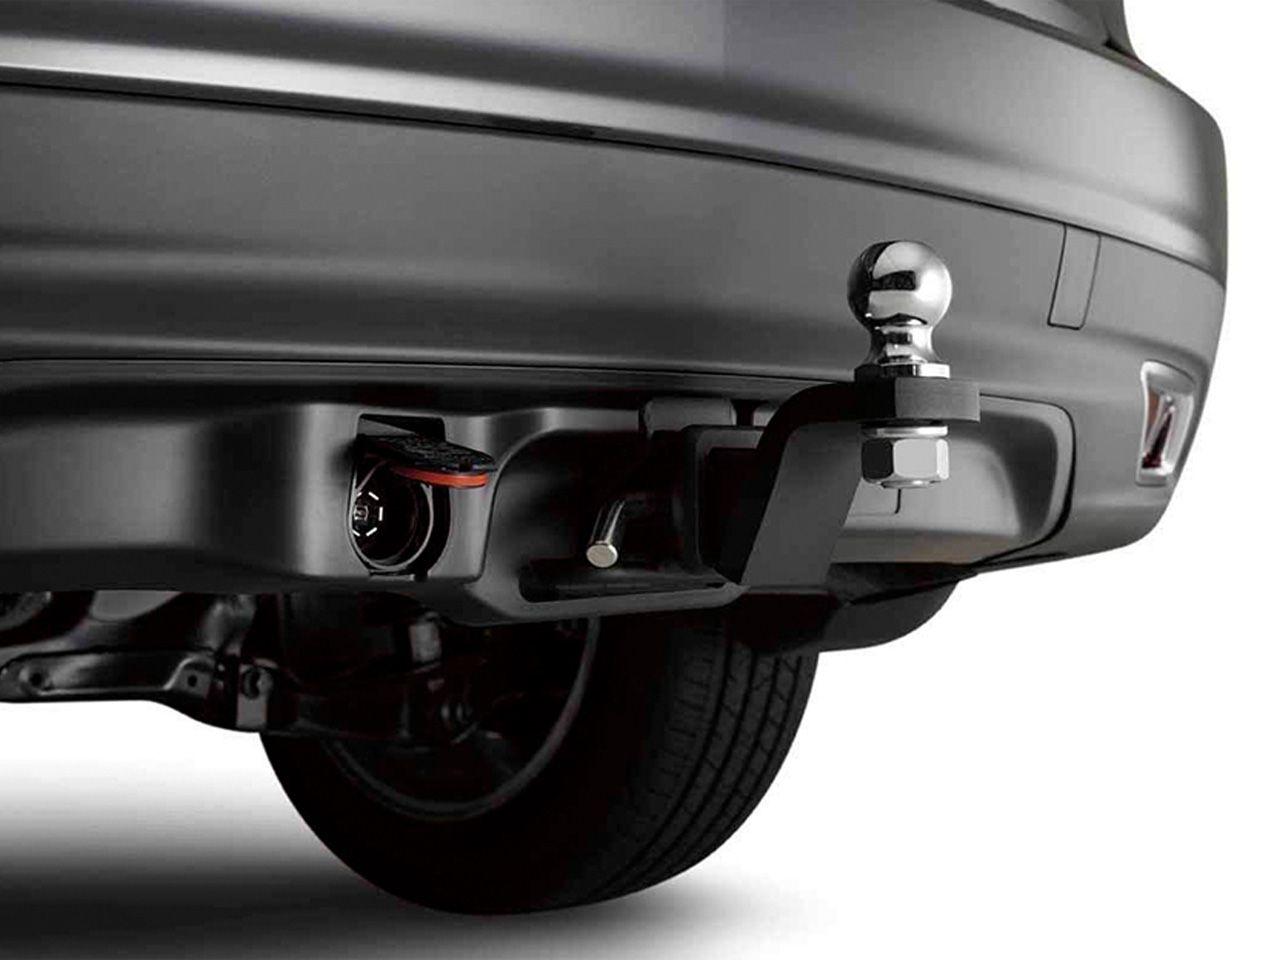 Engate Yaris Hatch  - Mirai Peças Toyota